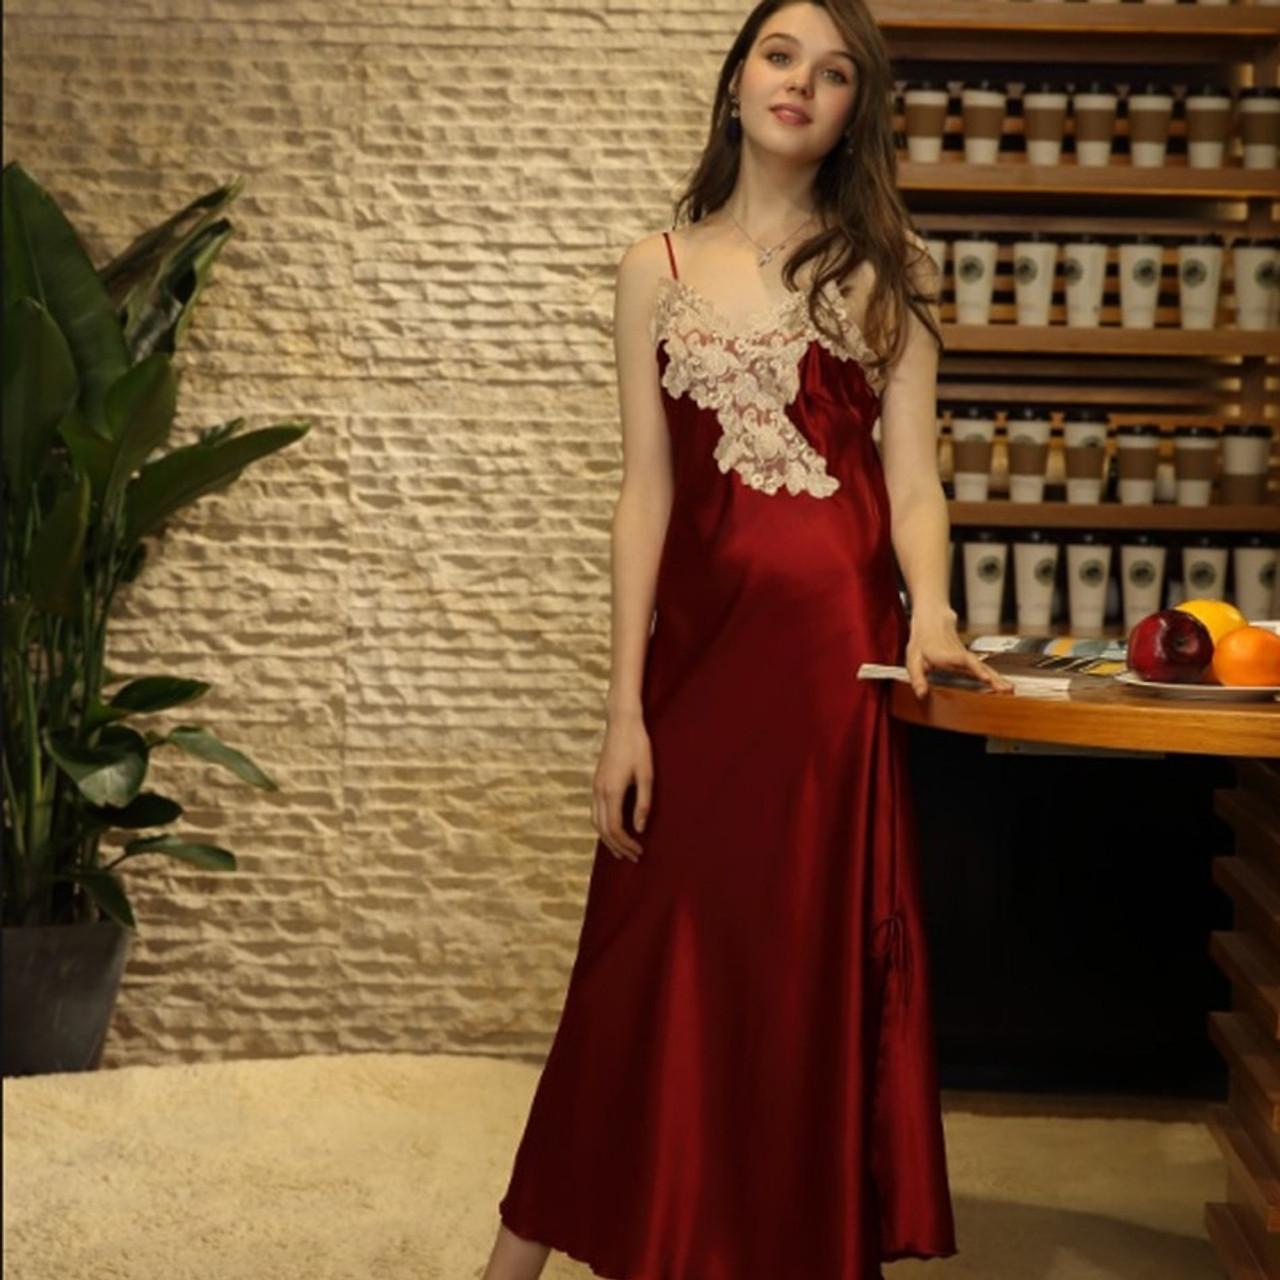 3bd0cbeaa904 ... Ladies Sexy Silk Satin Nightgown Long Night Dress Lace Sleepshirt  Summer Nightdress V-neck Sleeping ...